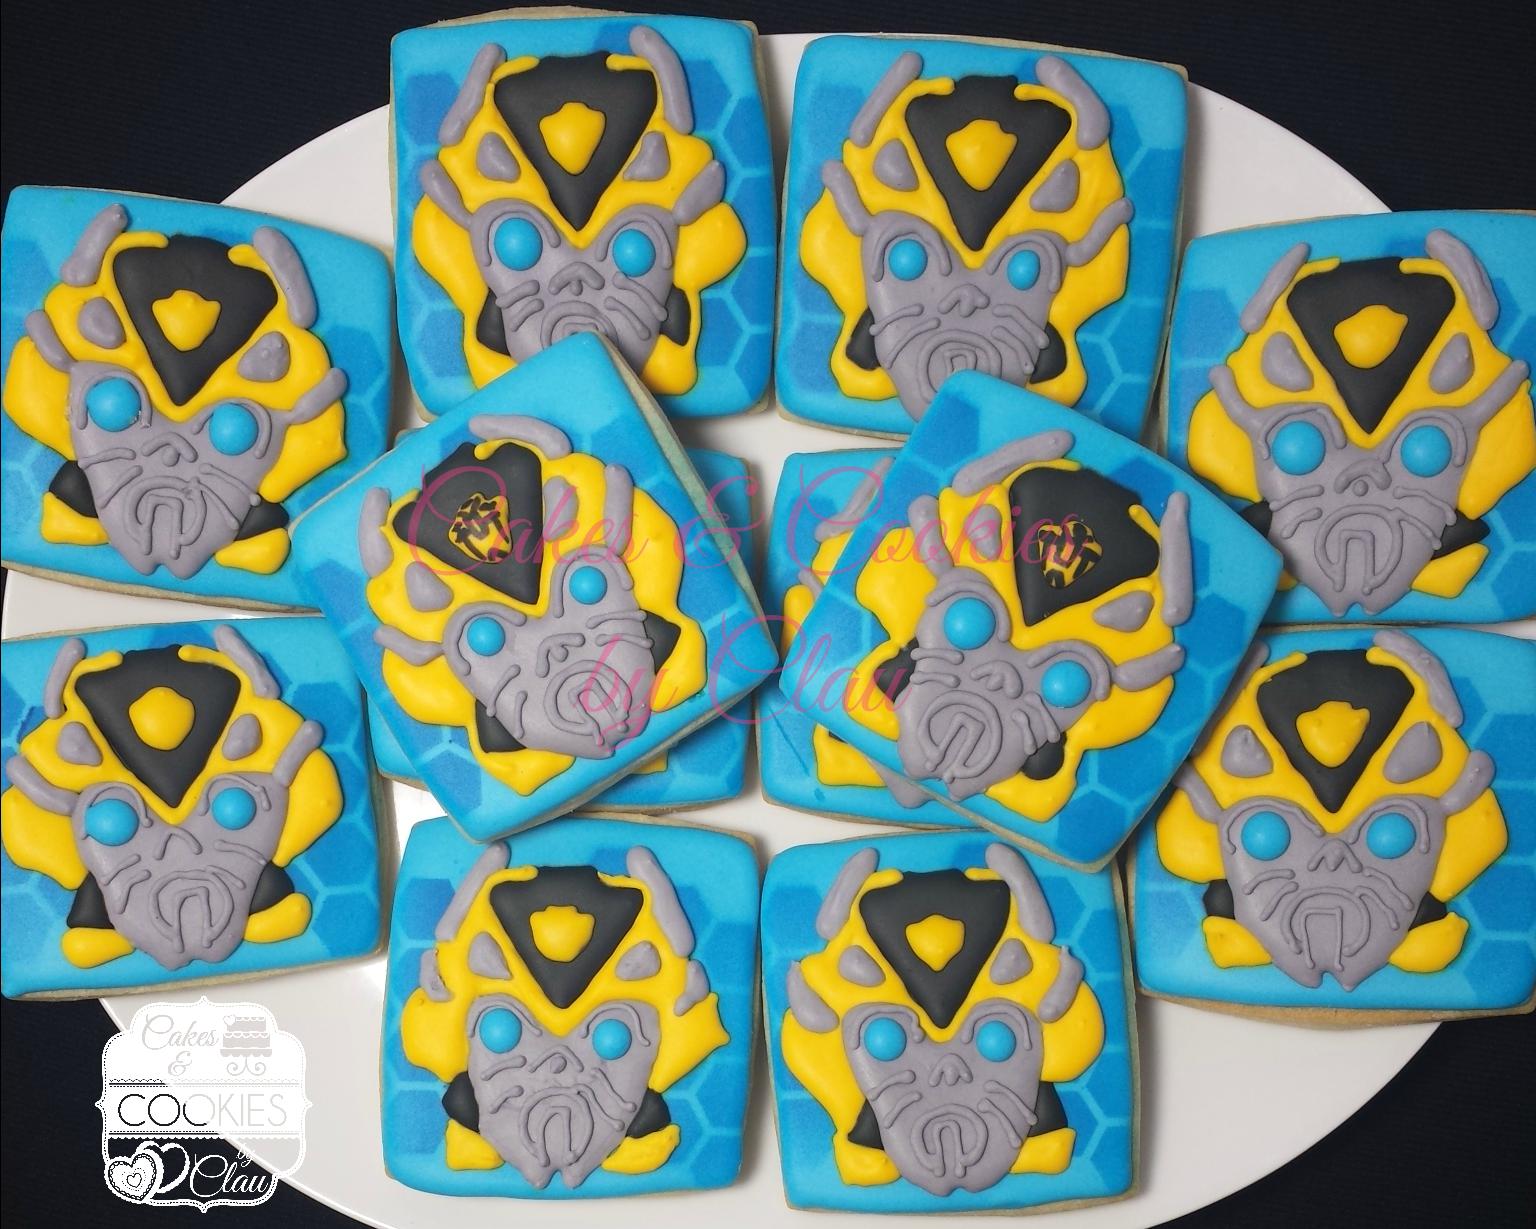 Transformers Bumblebee Cookies